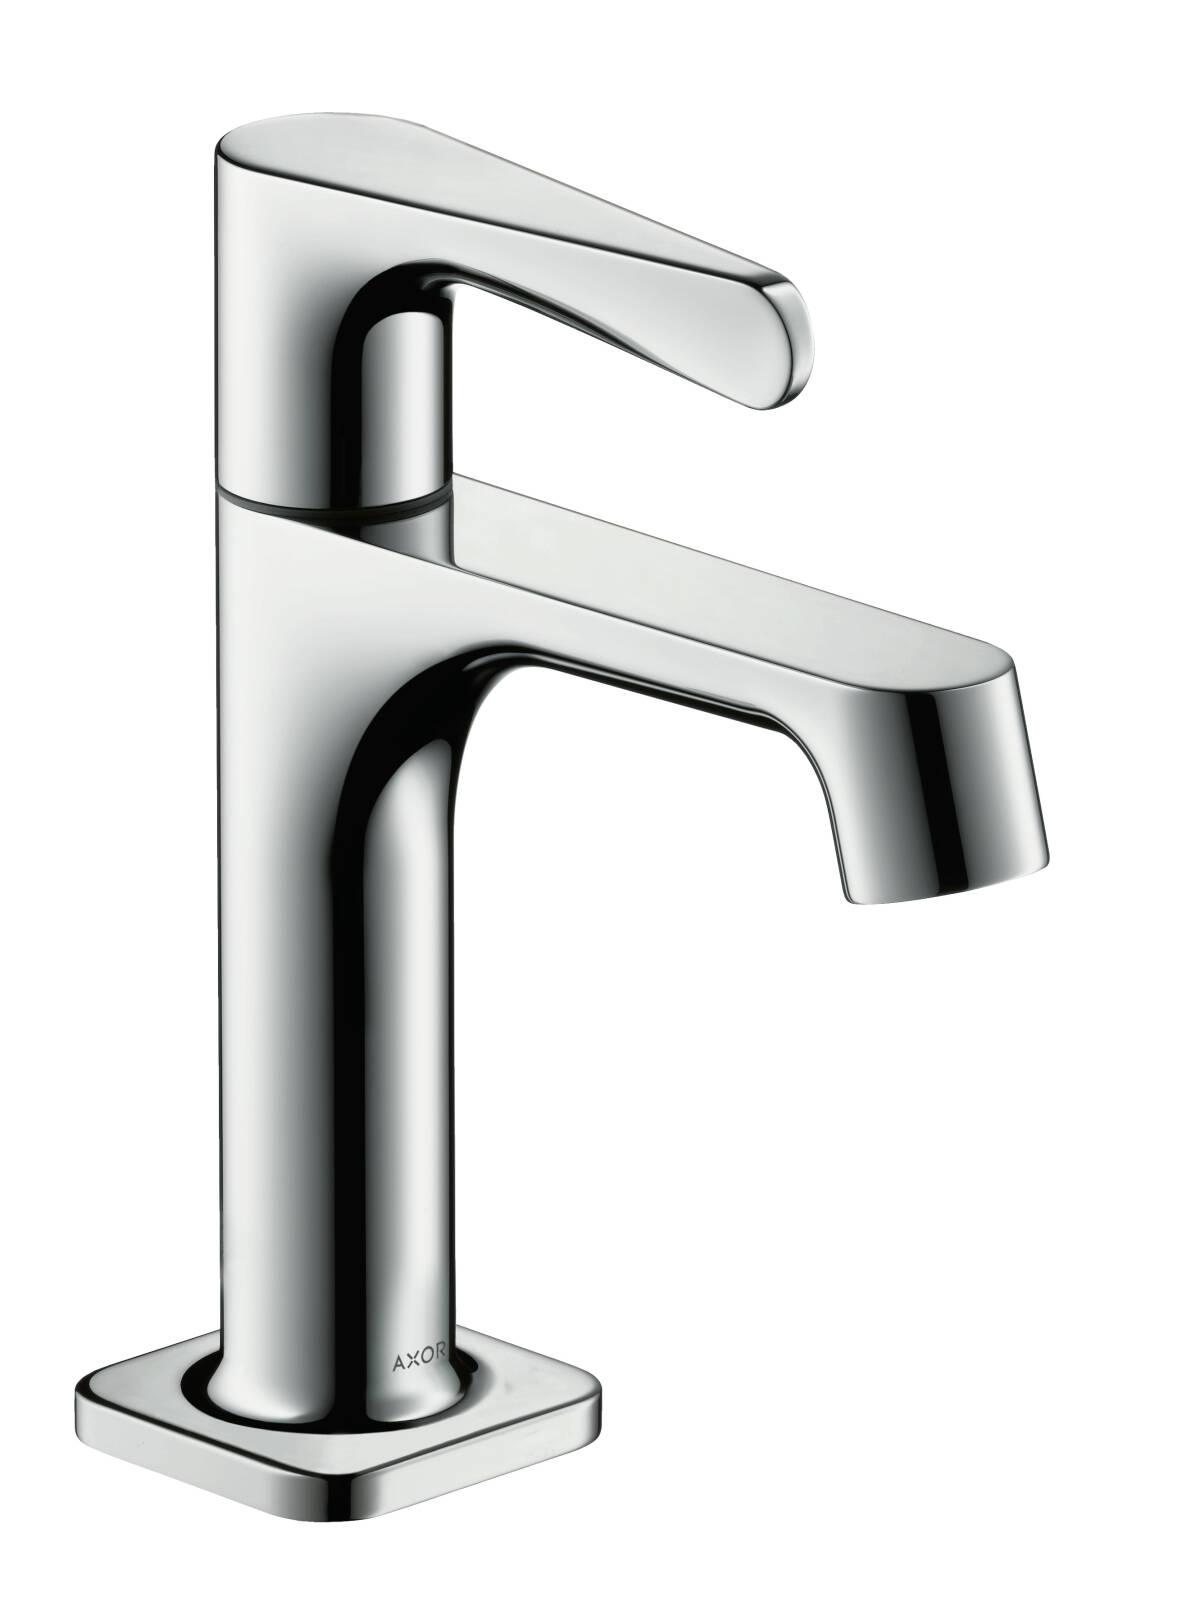 Pillar tap 90 without waste set, Polished Brass, 34130930